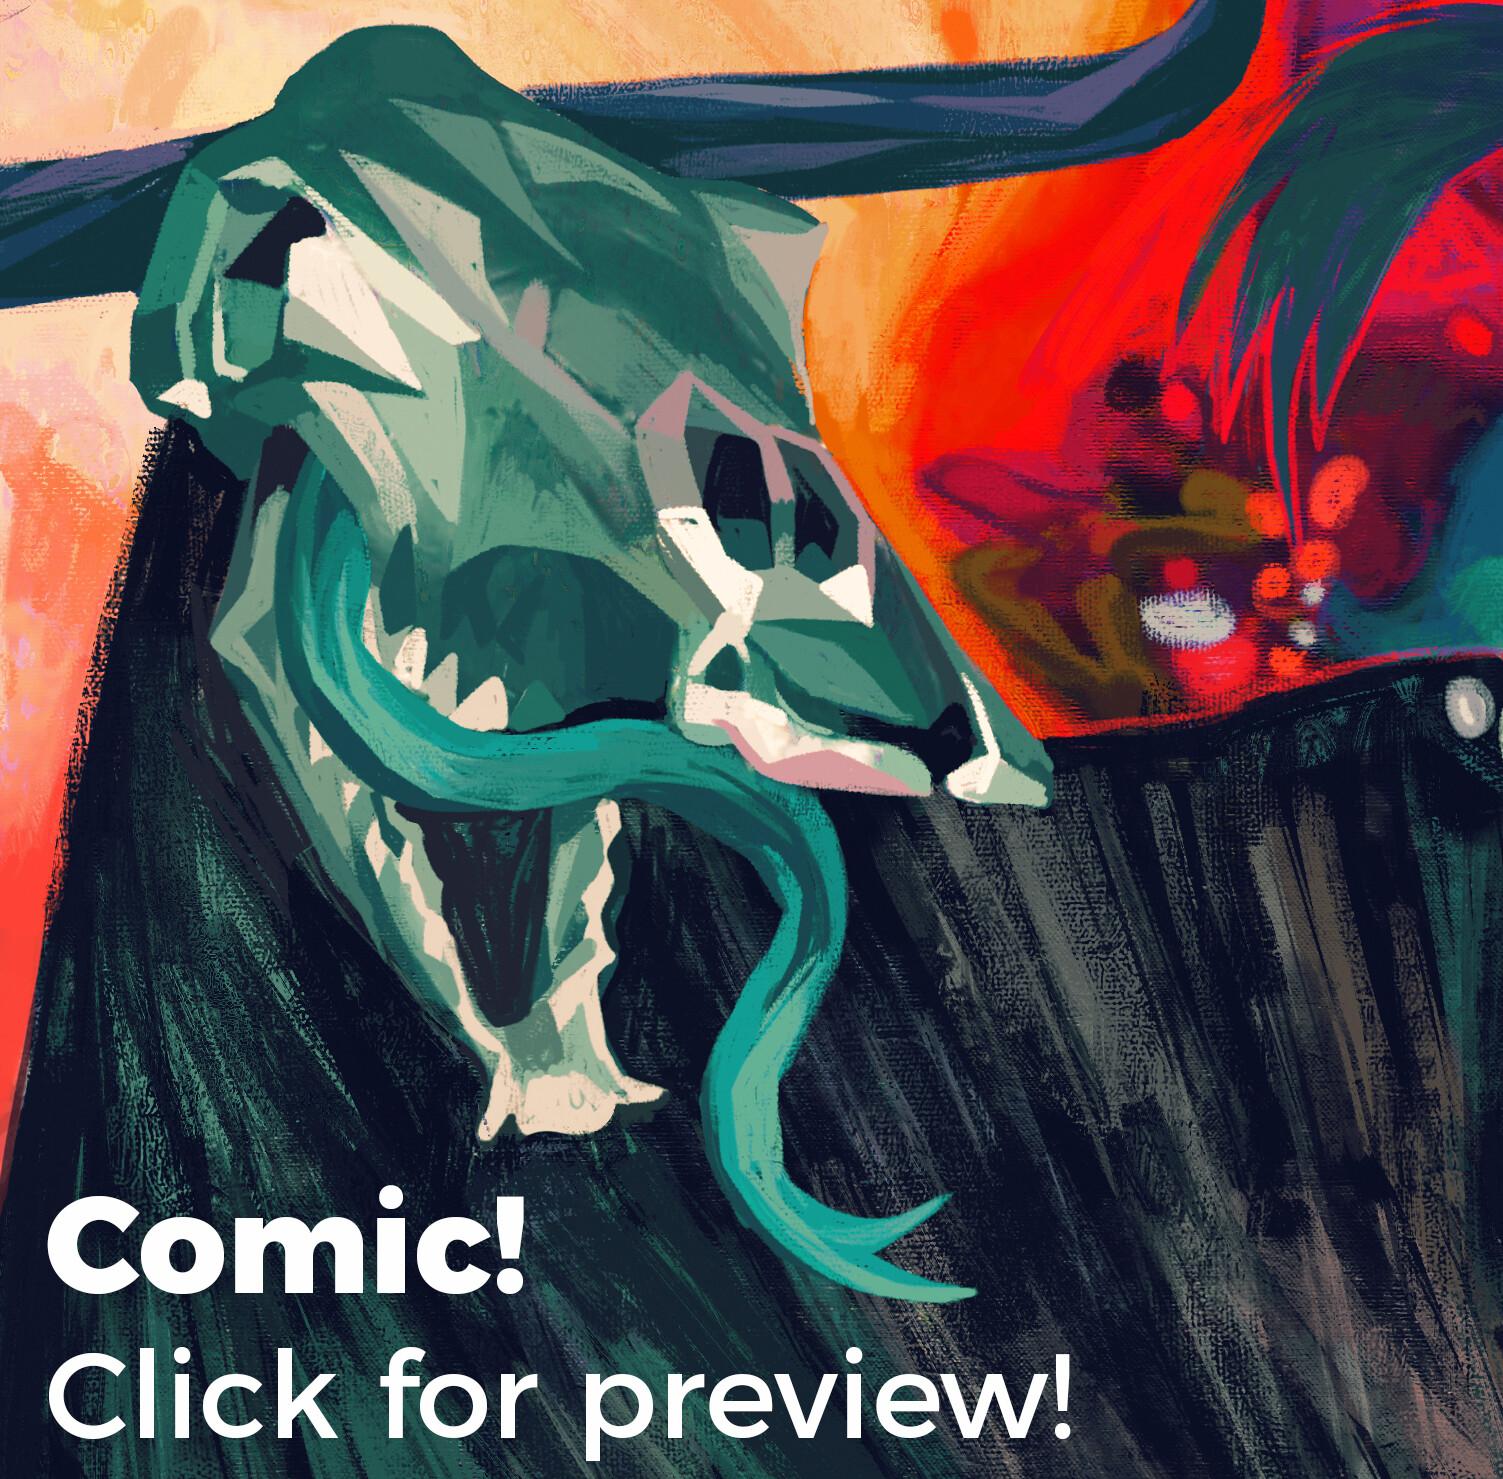 Vekovnici comic pages (no text)